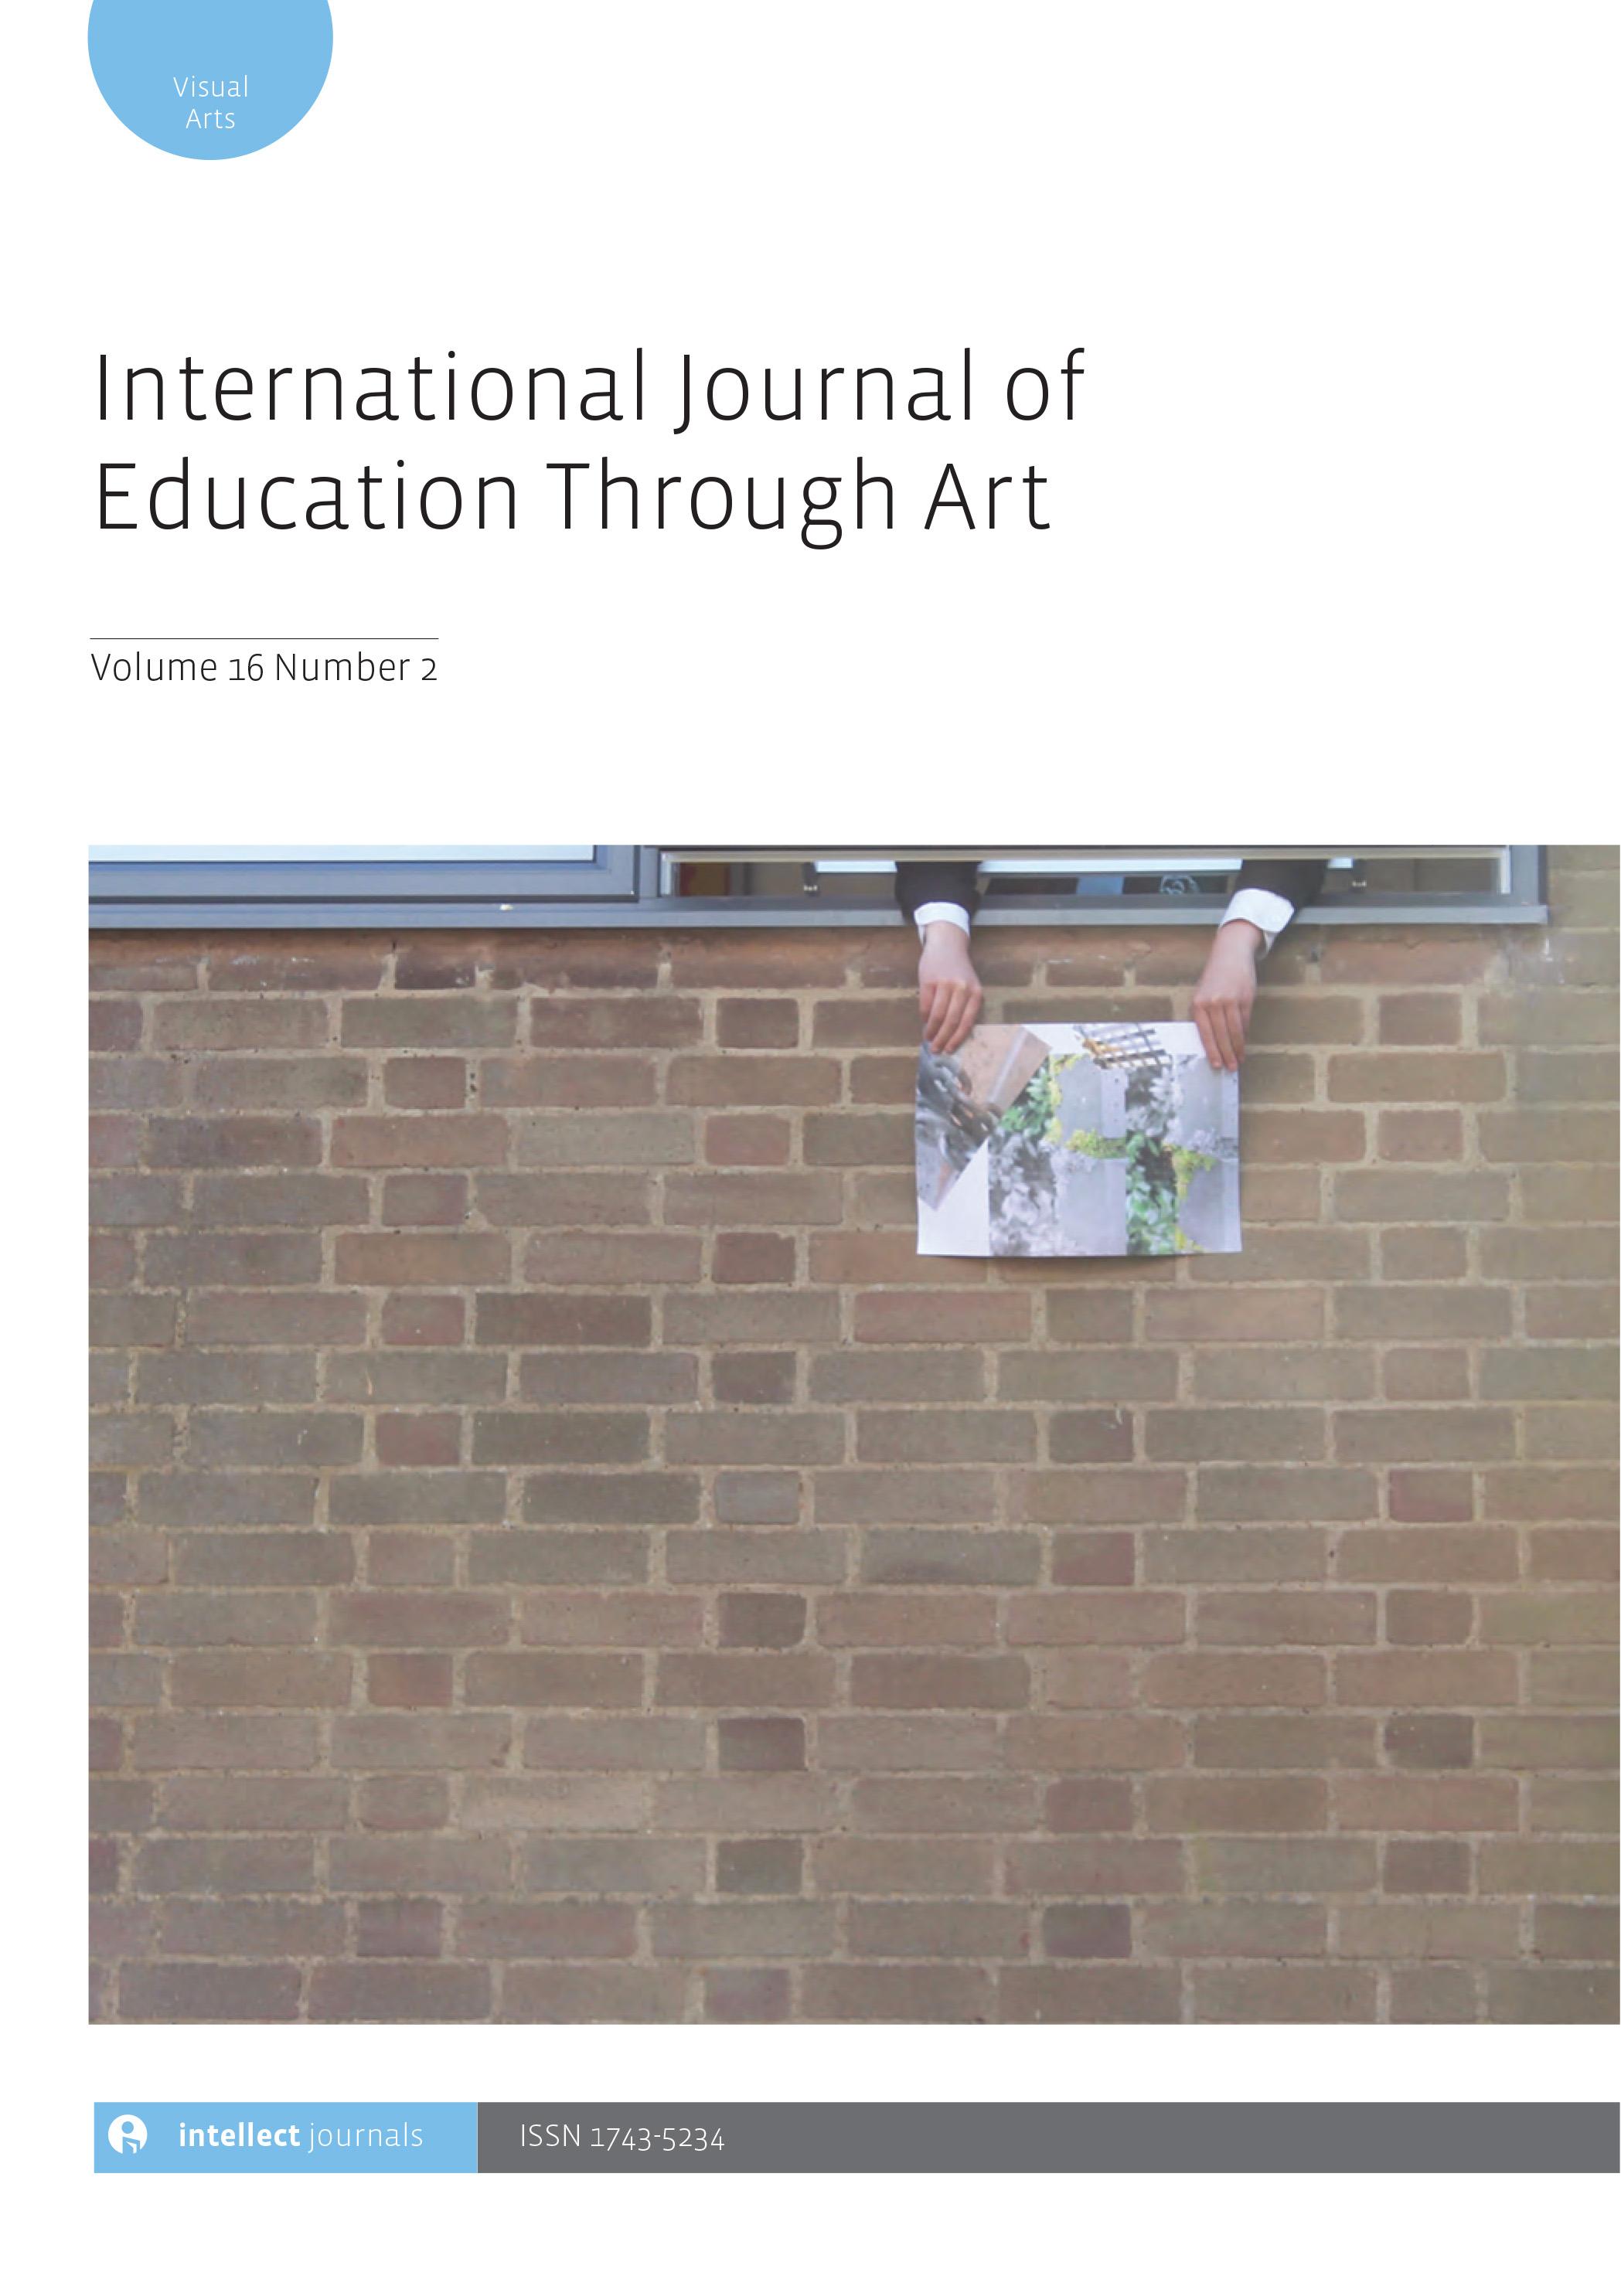 View Vol. 16 No. 2 (2020): International Journal of Education Through Art